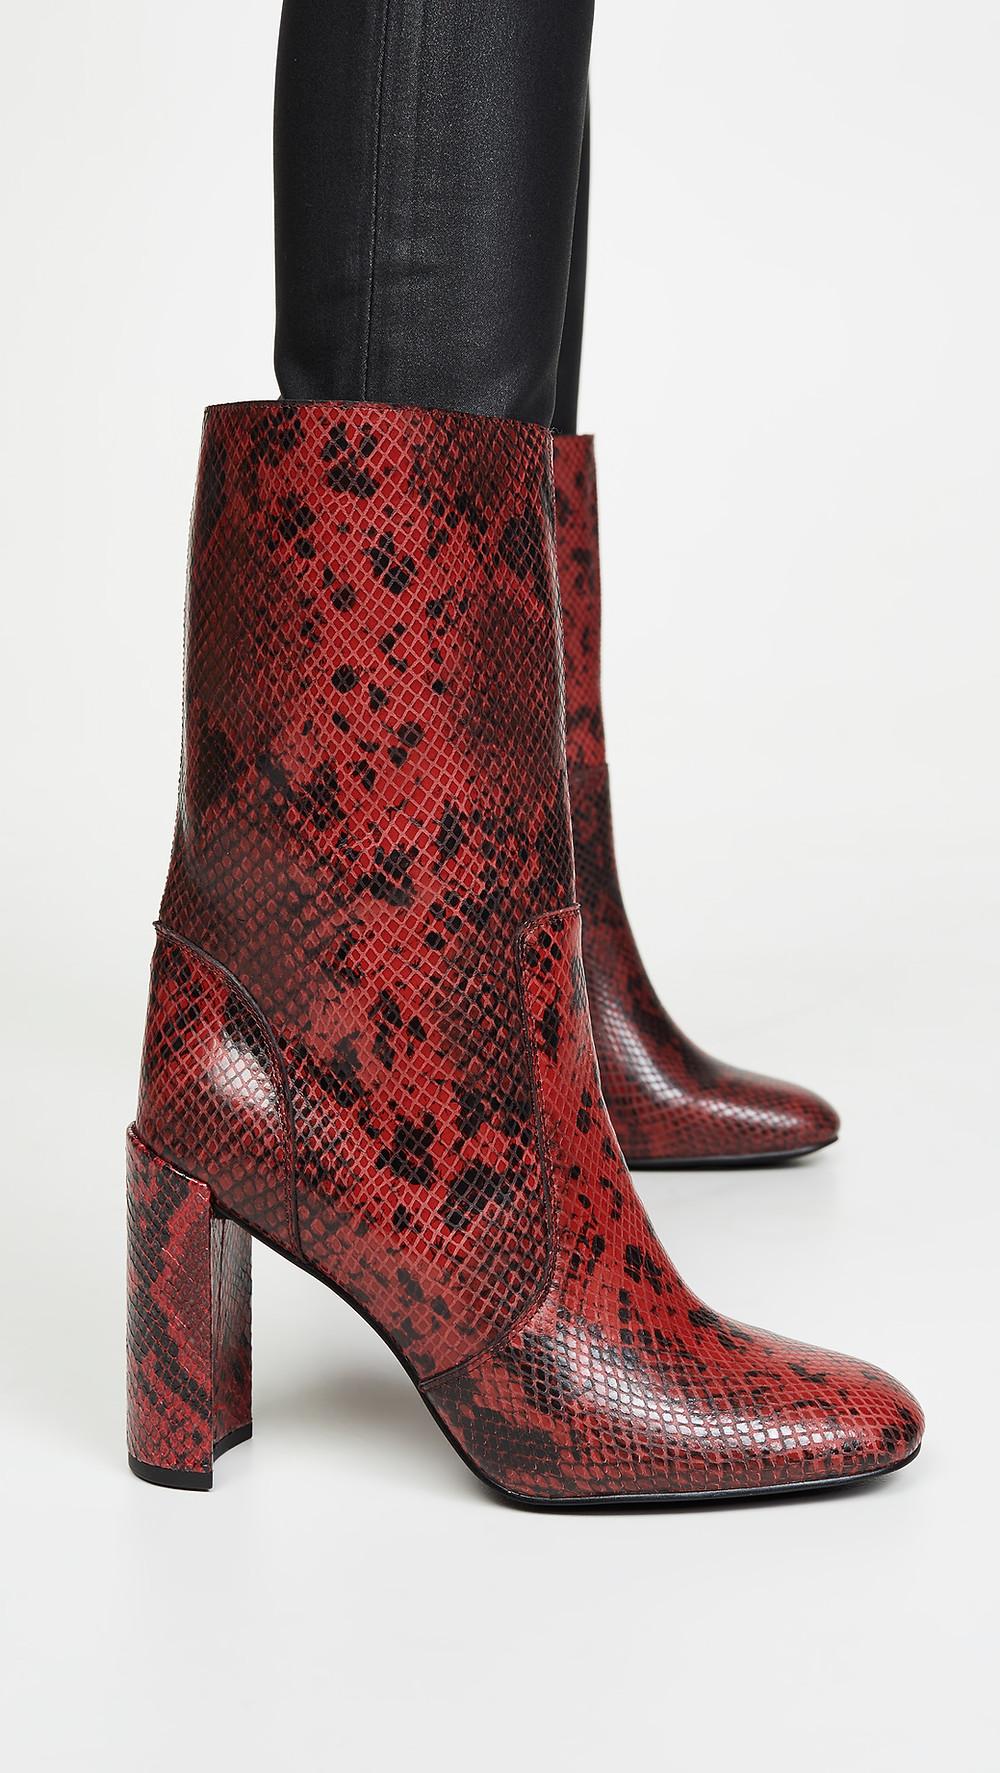 Jeffrey Campbell Entuit-Mid Boots $205